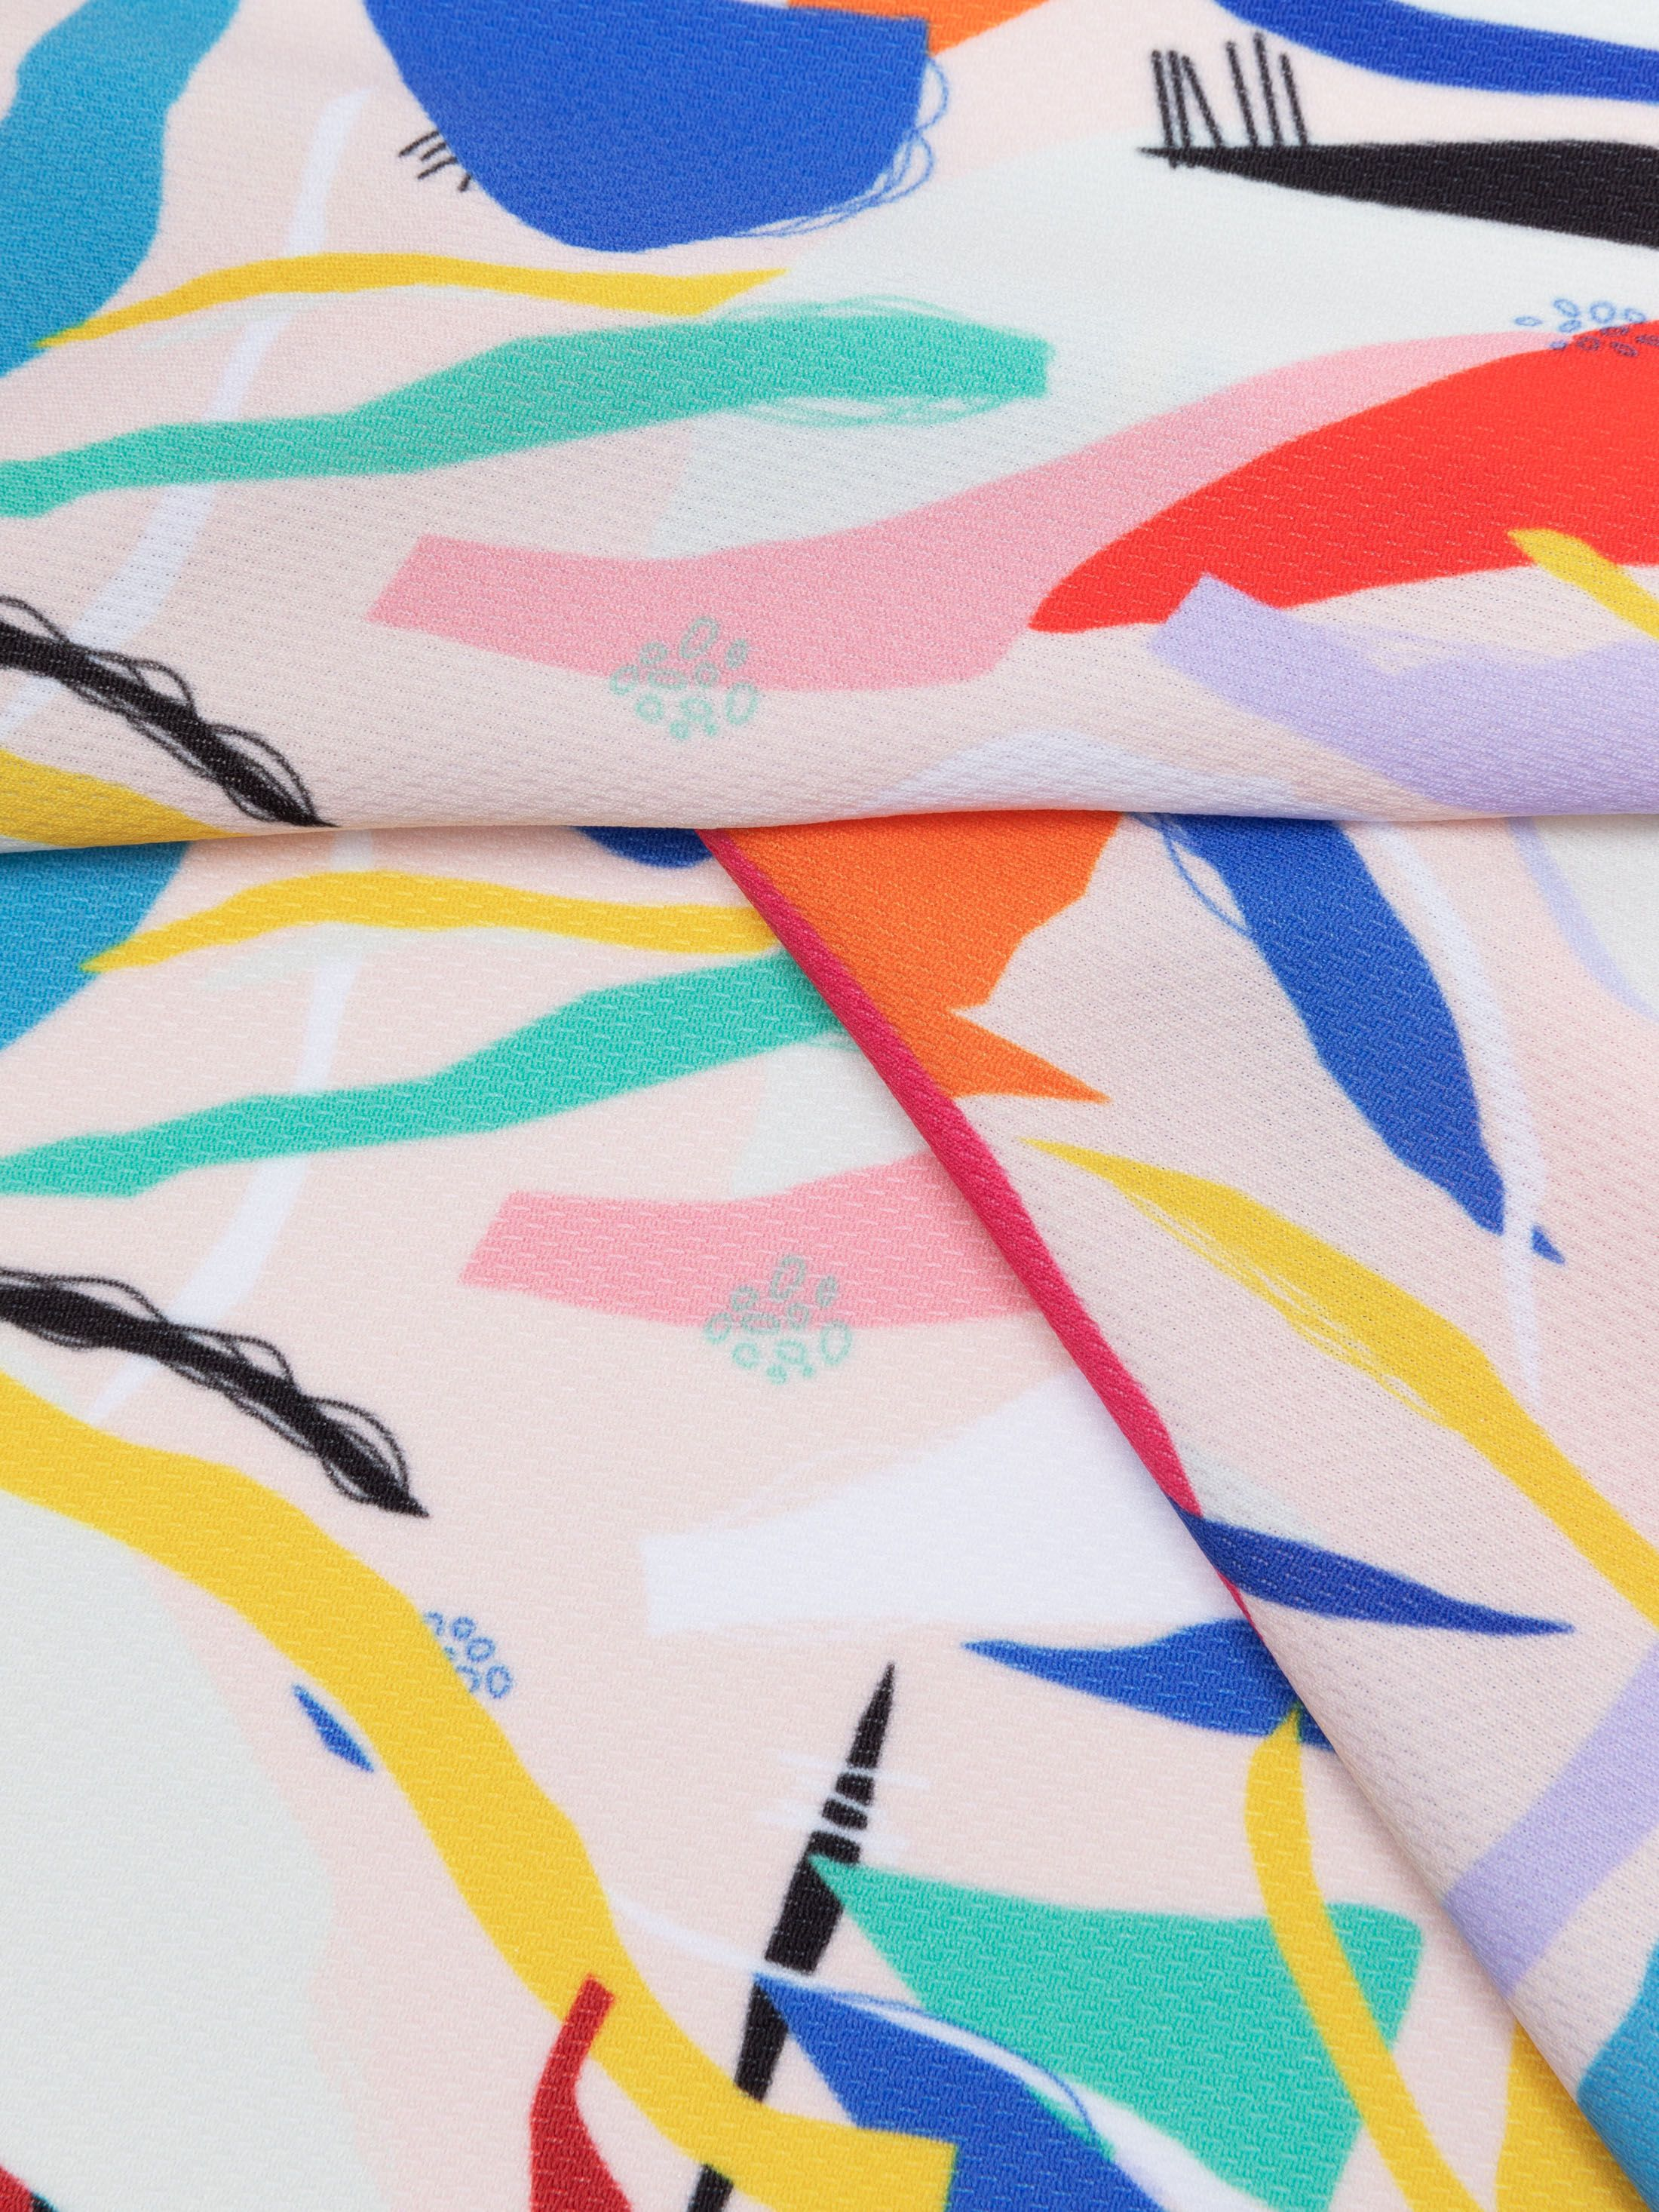 sportieve Airflow stof bedrukt oppervlakte detail